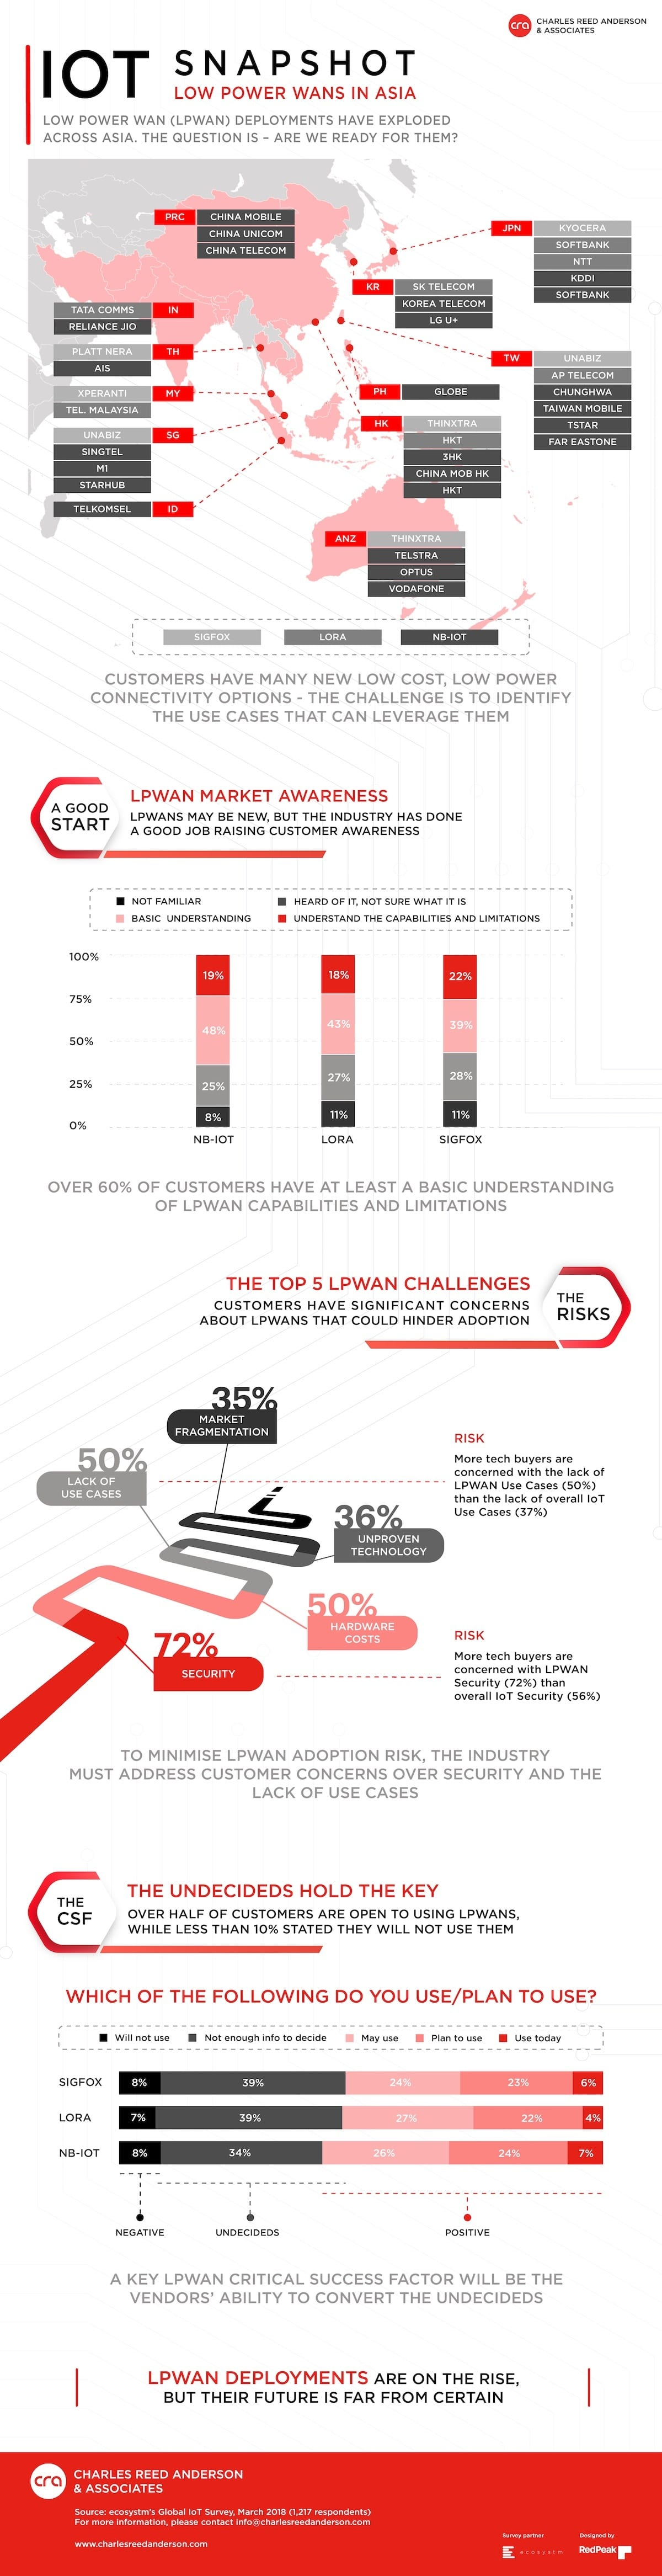 LPWAN infographic